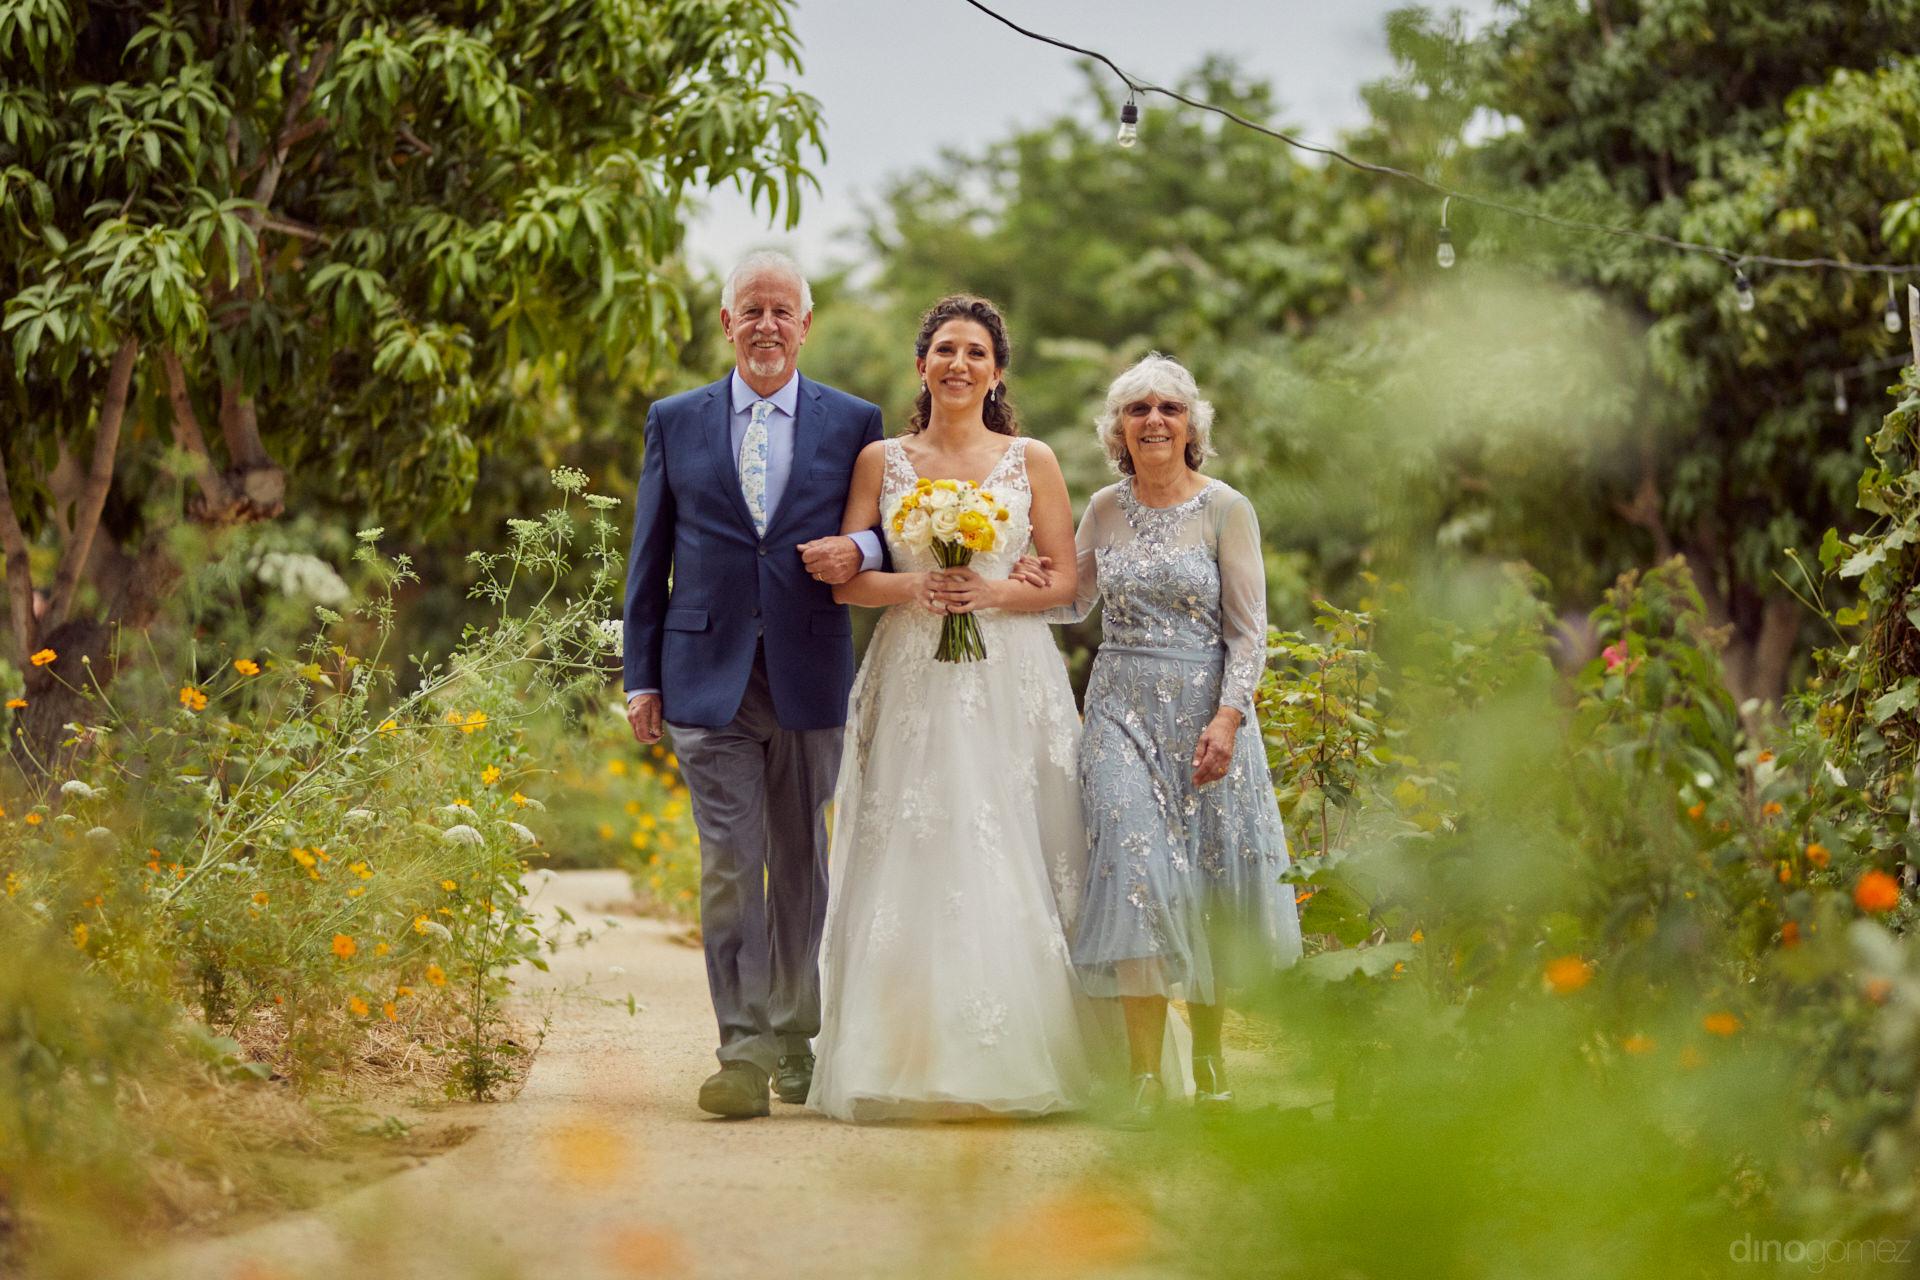 The Same Sydney James Wedding Venue Photographer - Hilary & Bryan Flora Wedding